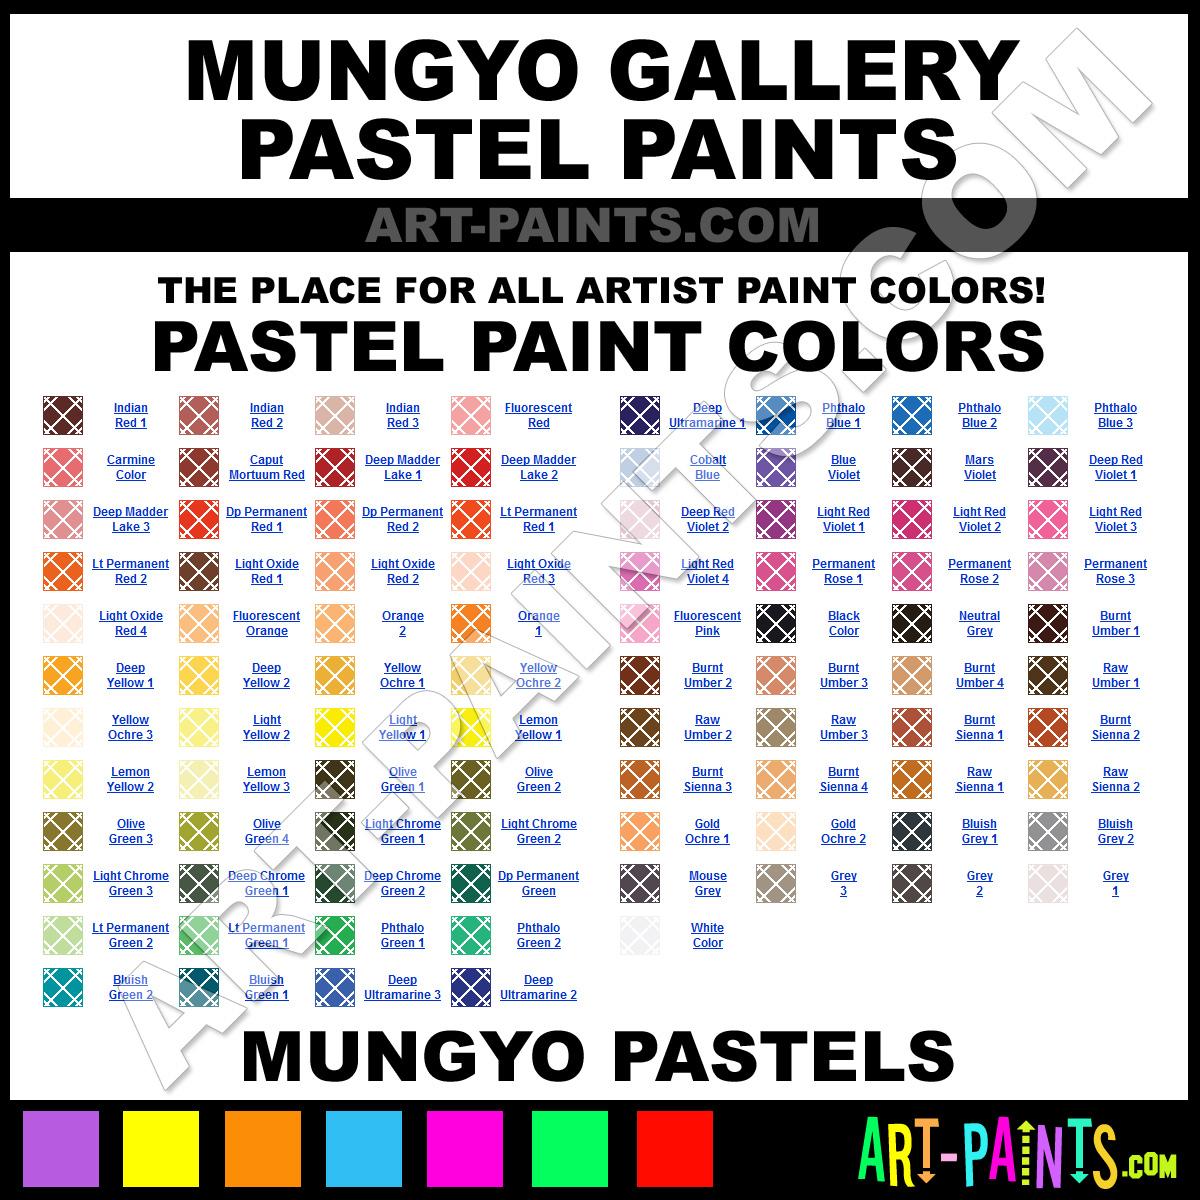 Folk art color chart acrylic paint - Mungyo Pastels Mungyo Gallery Paints